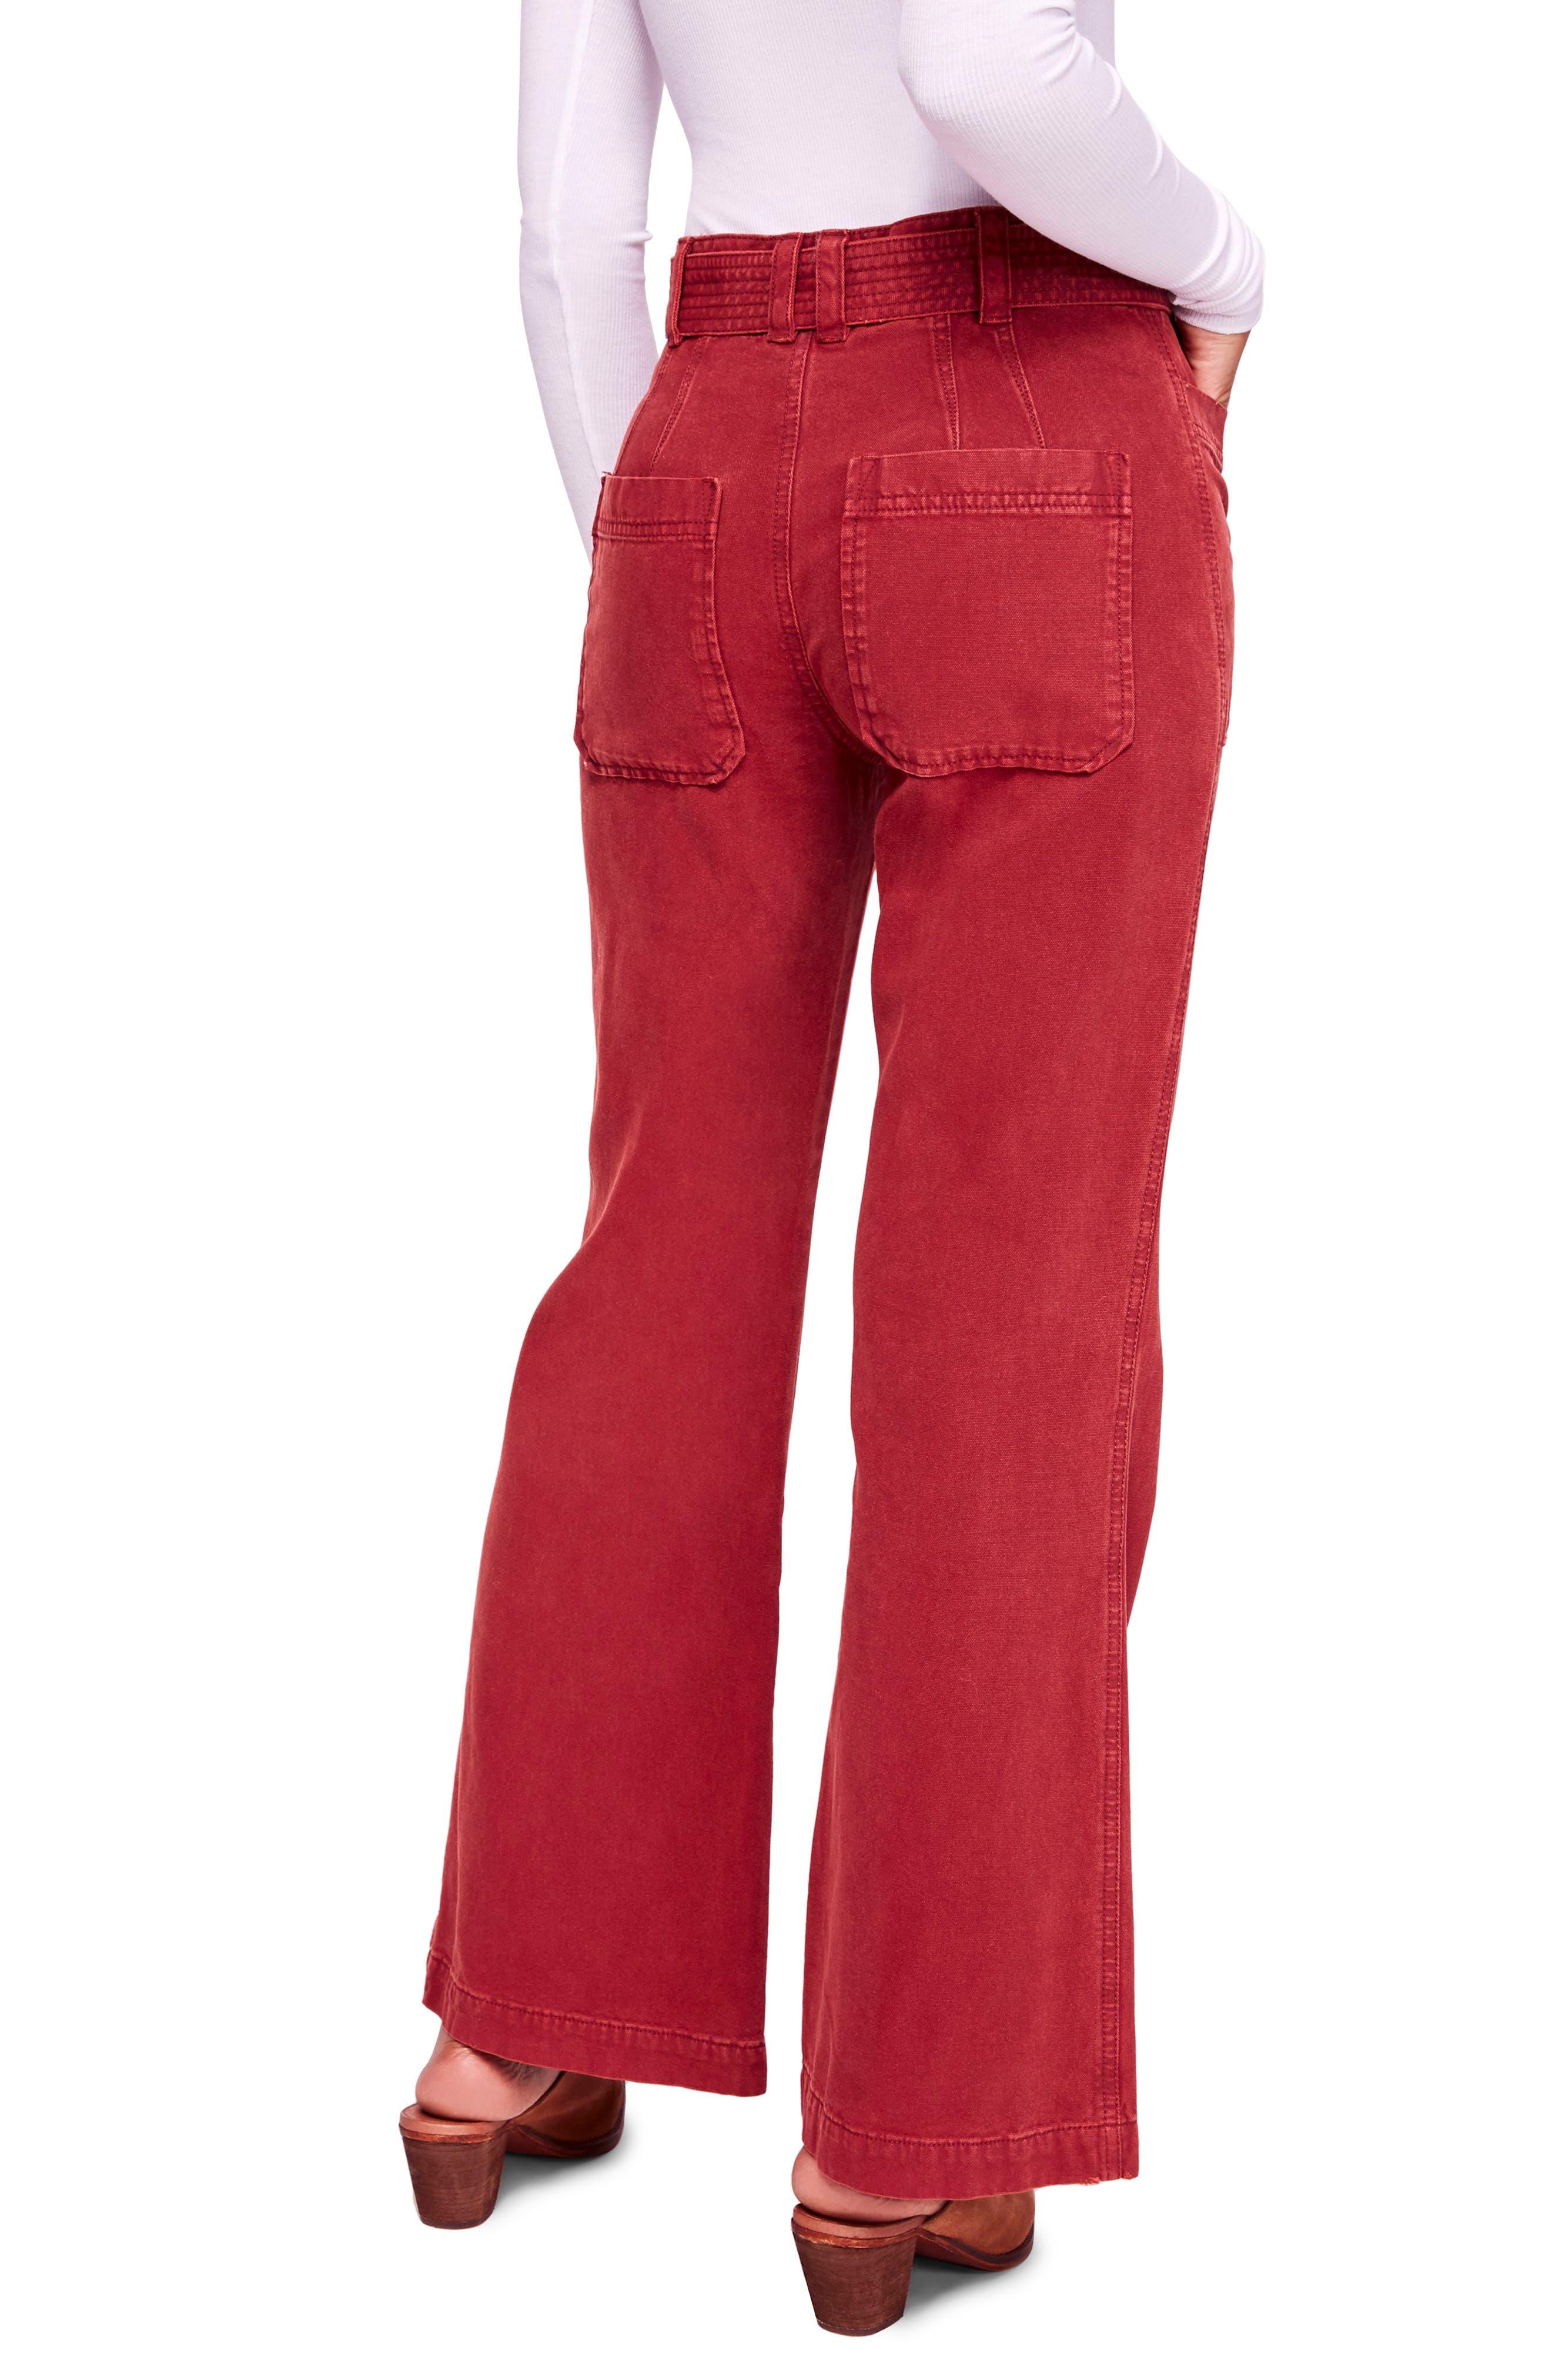 Corin Mod Slim Flare Pants,                             Alternate thumbnail 2, color,                             WINE